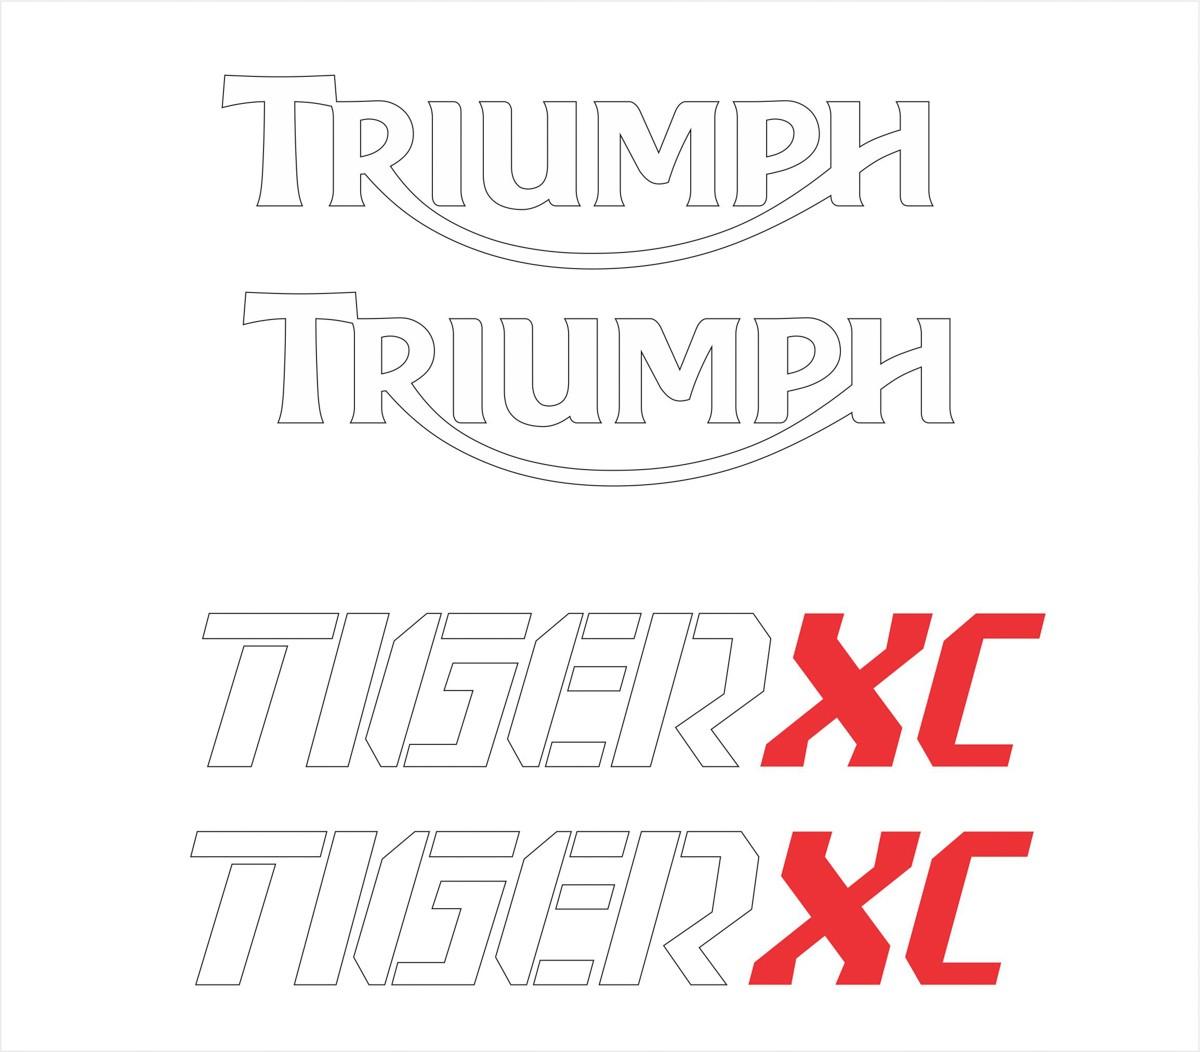 Kit Adesivo Triumph Tiger 800xc 800 Xc 2016 Preta Tg012